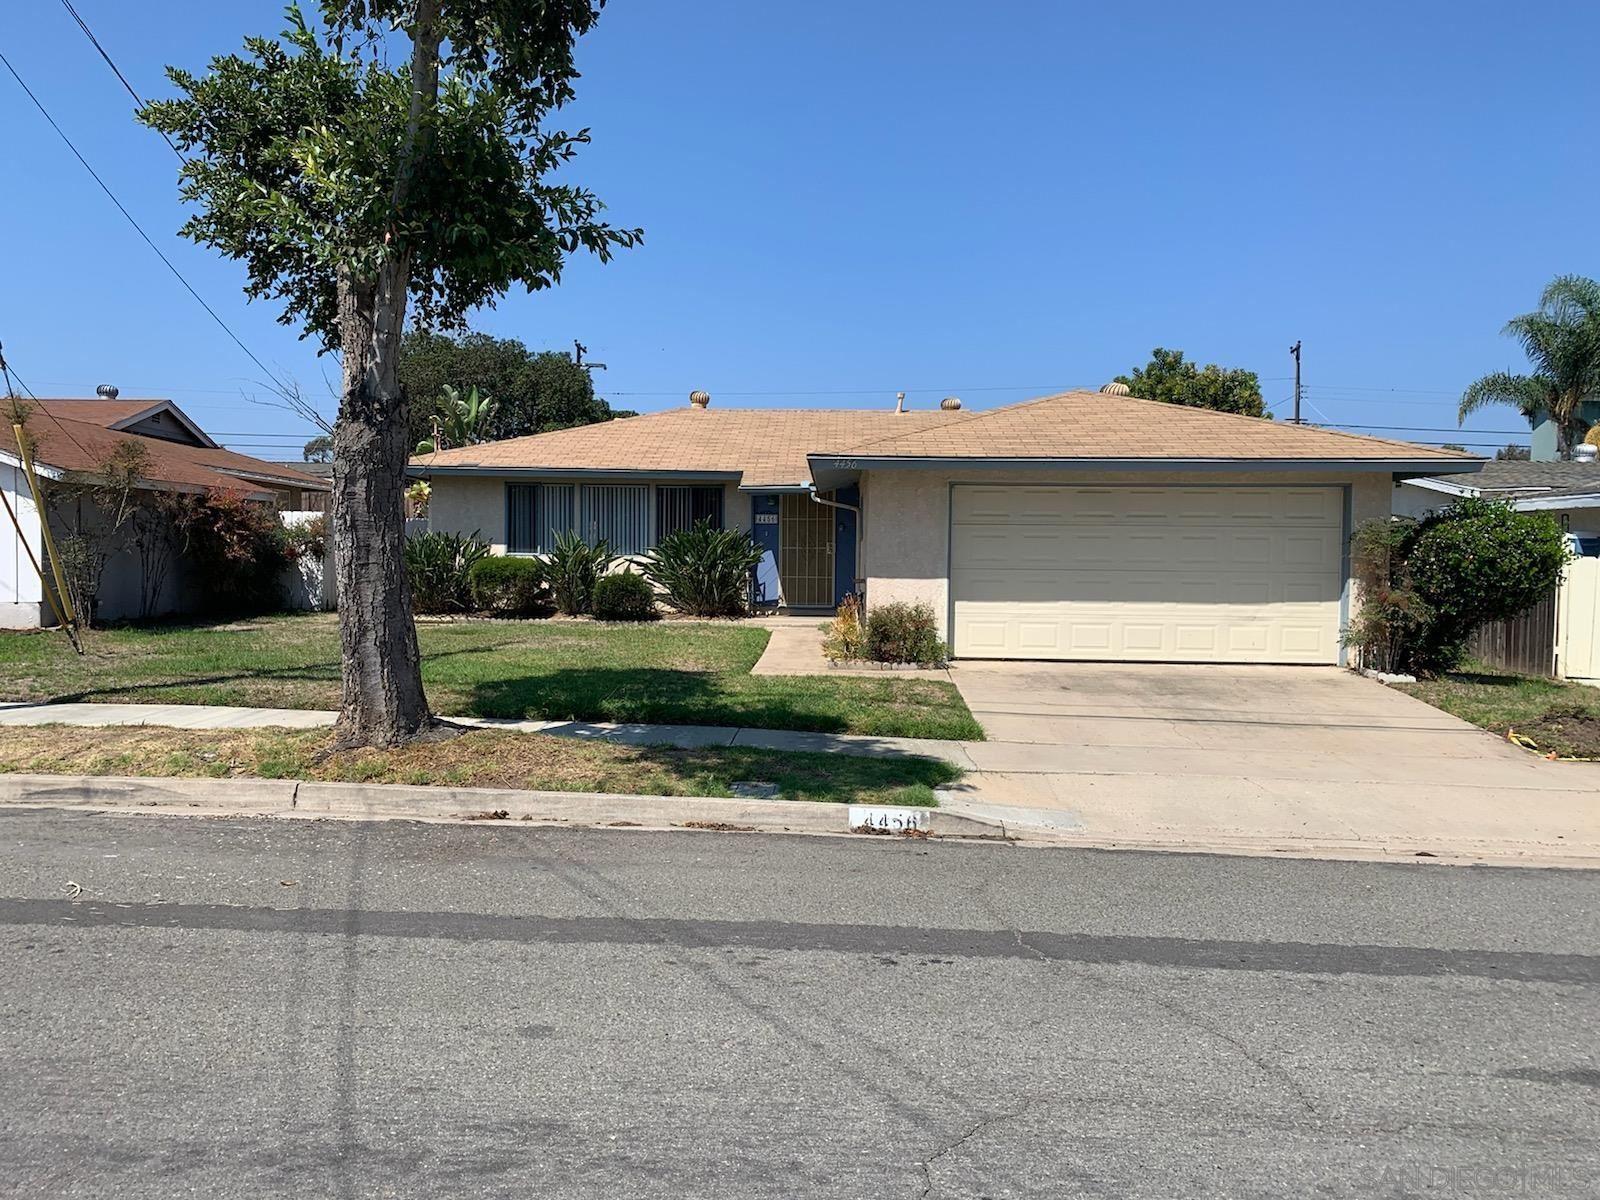 4456 Donald Ave, San Diego, CA 92117 - #: 210024469